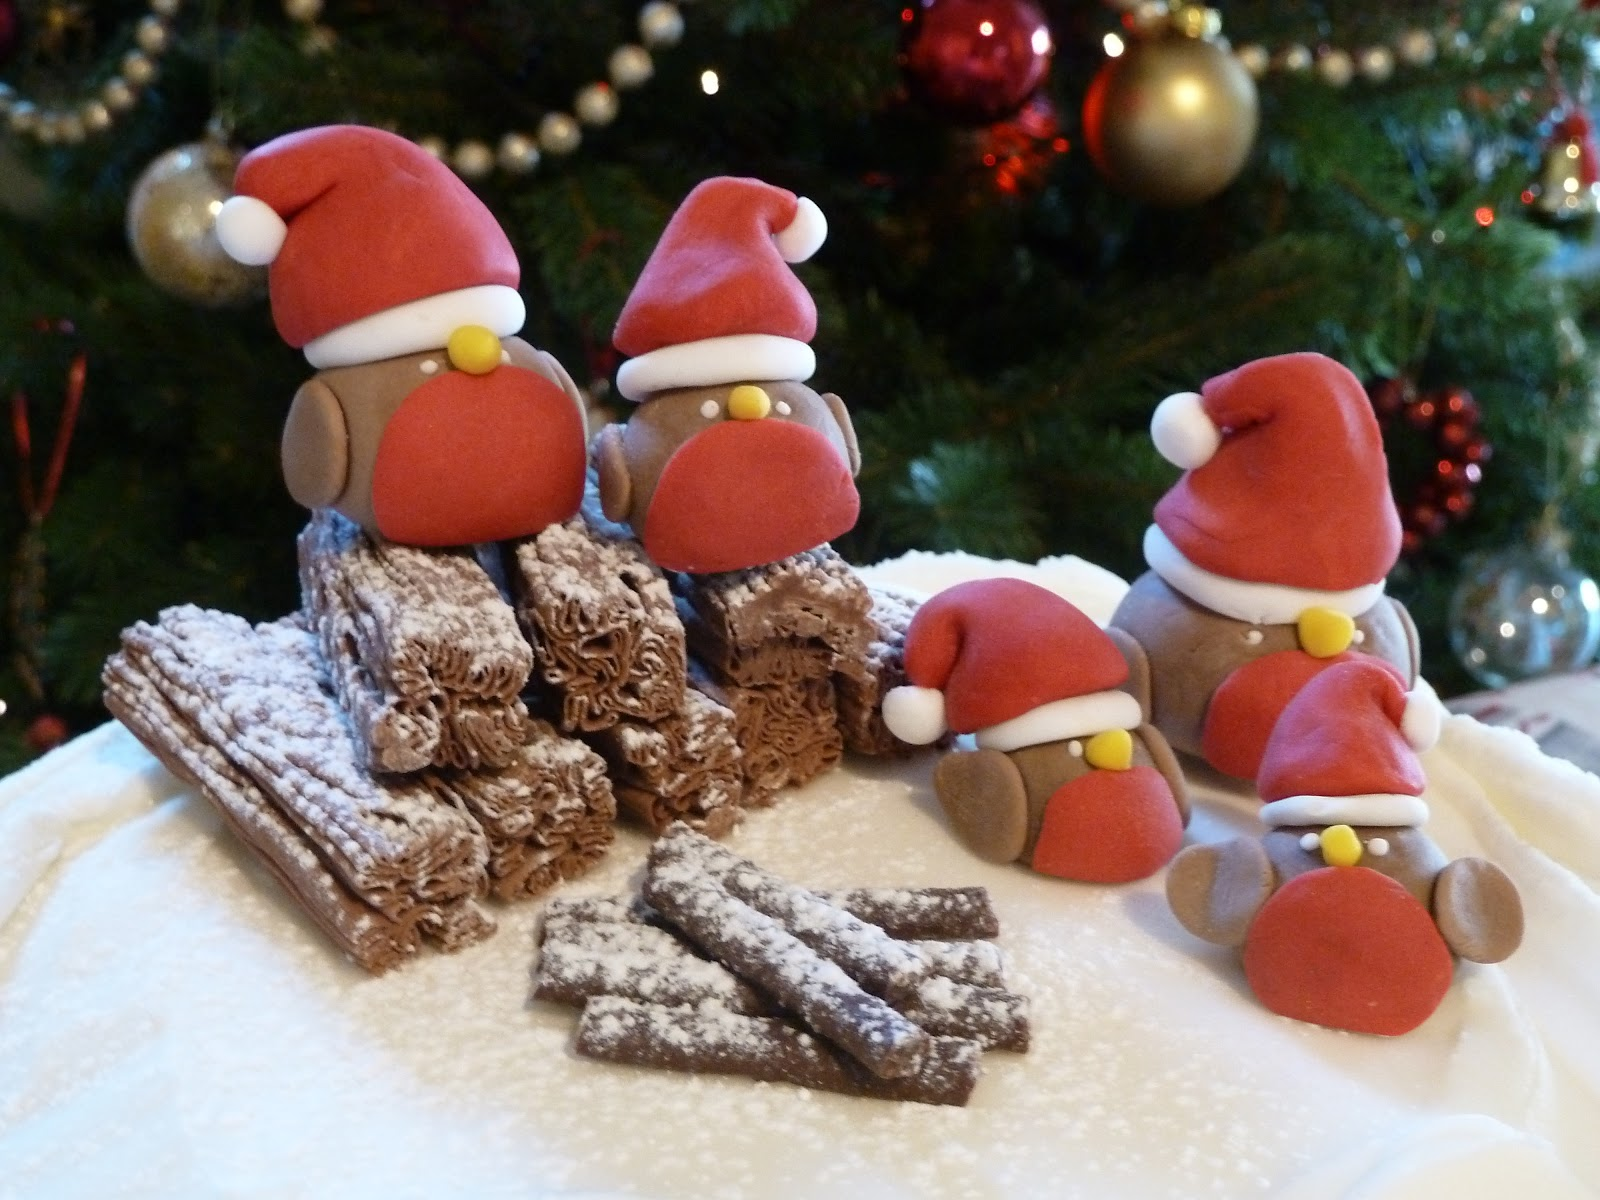 How Do I Make Icing For Christmas Cake